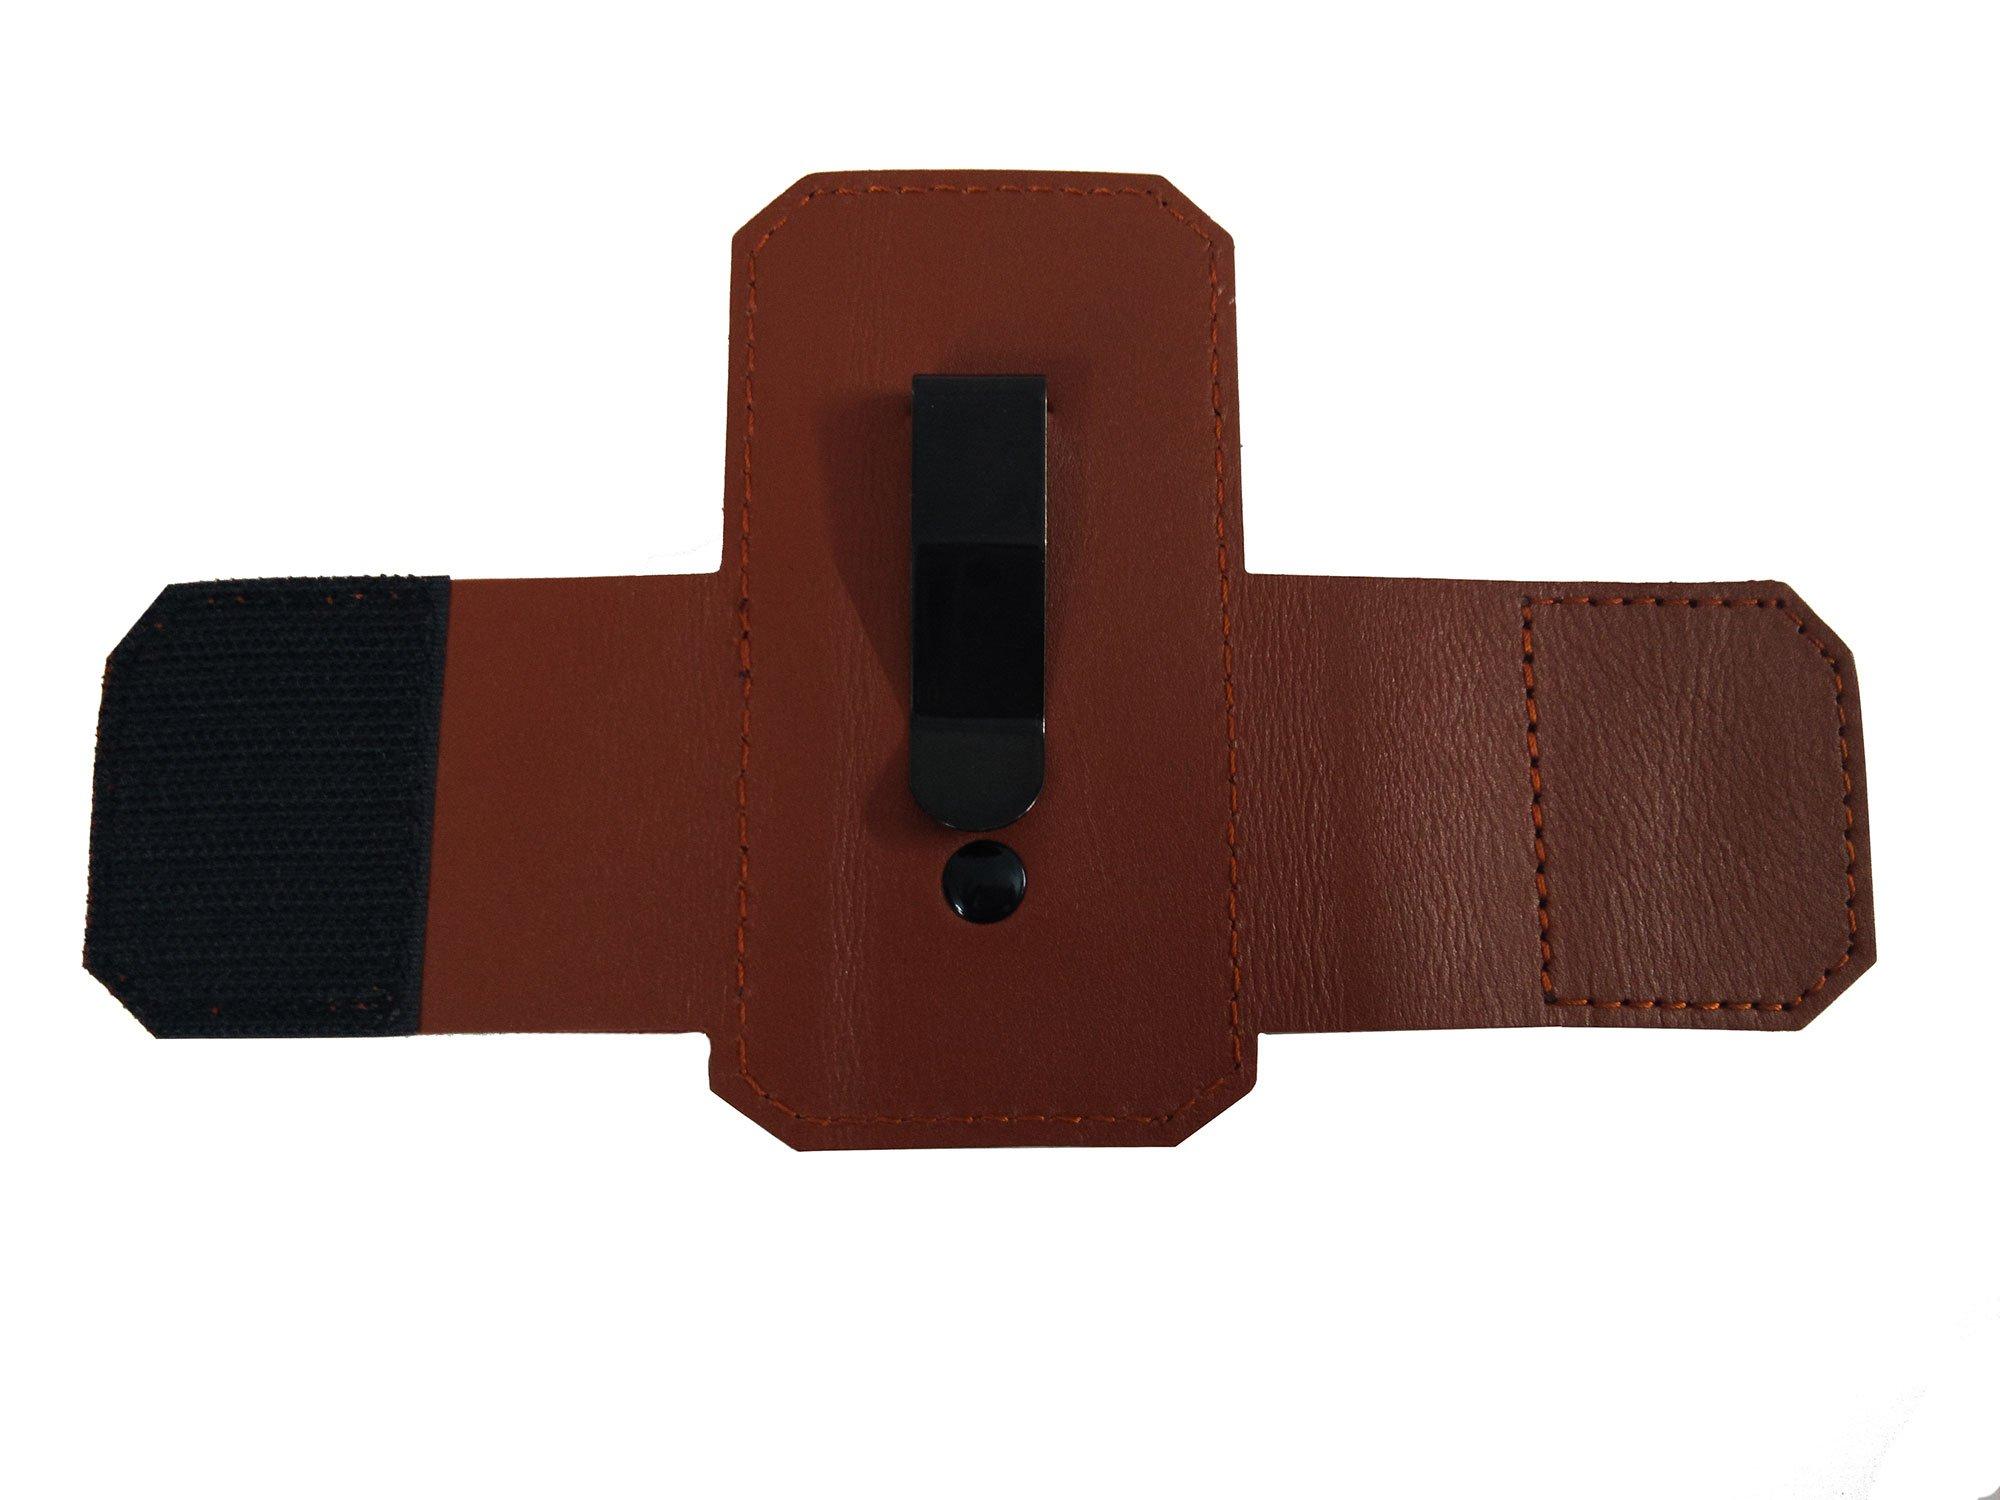 100% -Genuine Leather 3M Littmann Stethoscope Case for Women Men - MDF Adscope Stethoscope Holder Clip, Medical Nursing Accessories ADC Steth Holster Cover Kit for Nurse Cardiology Doctor (Brown) by BlingSoul (Image #3)